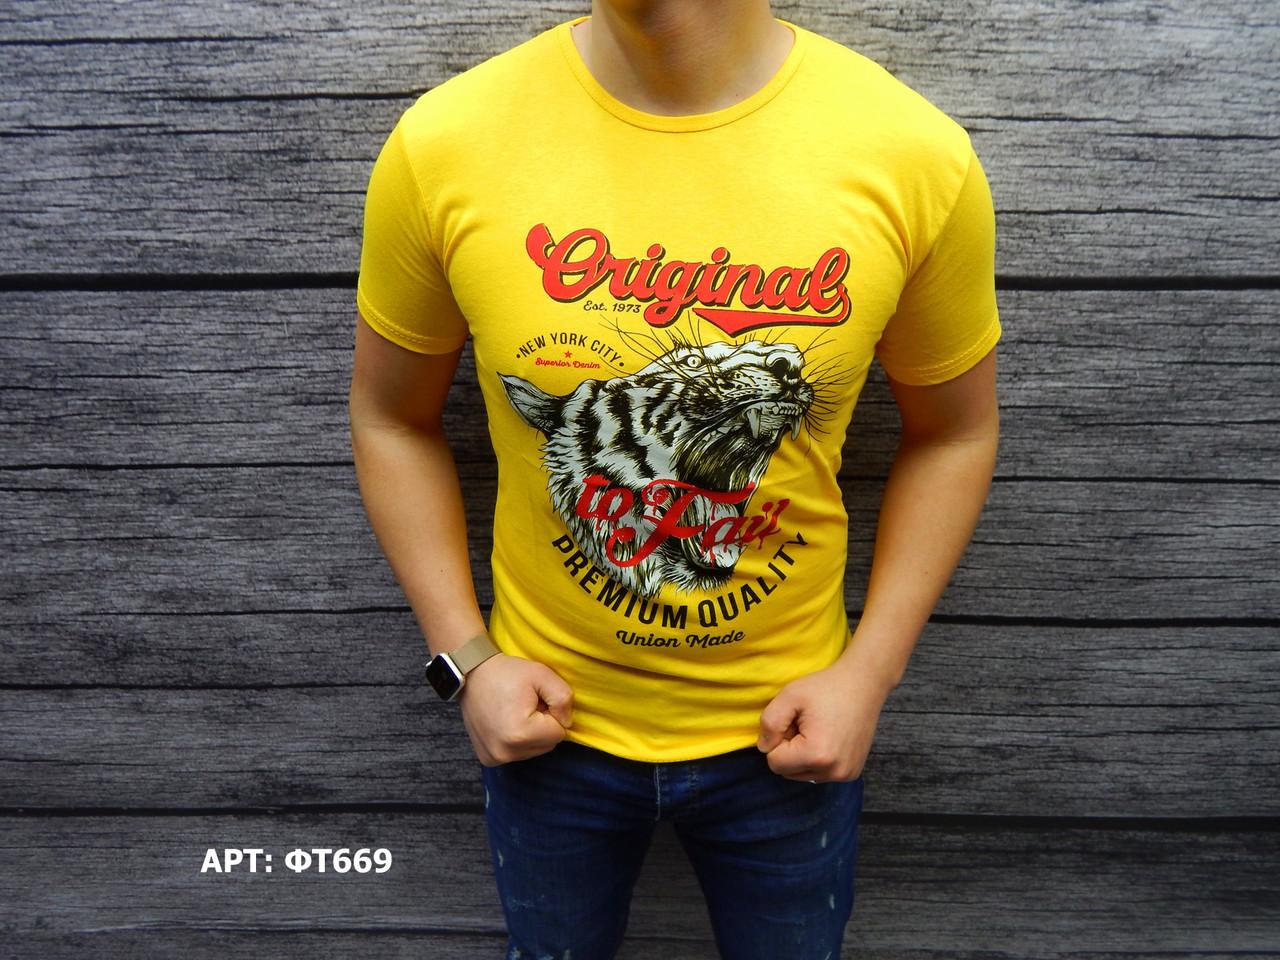 Мужская футболка. Размеры: M/L/XL/2XL (маломерят на размер)